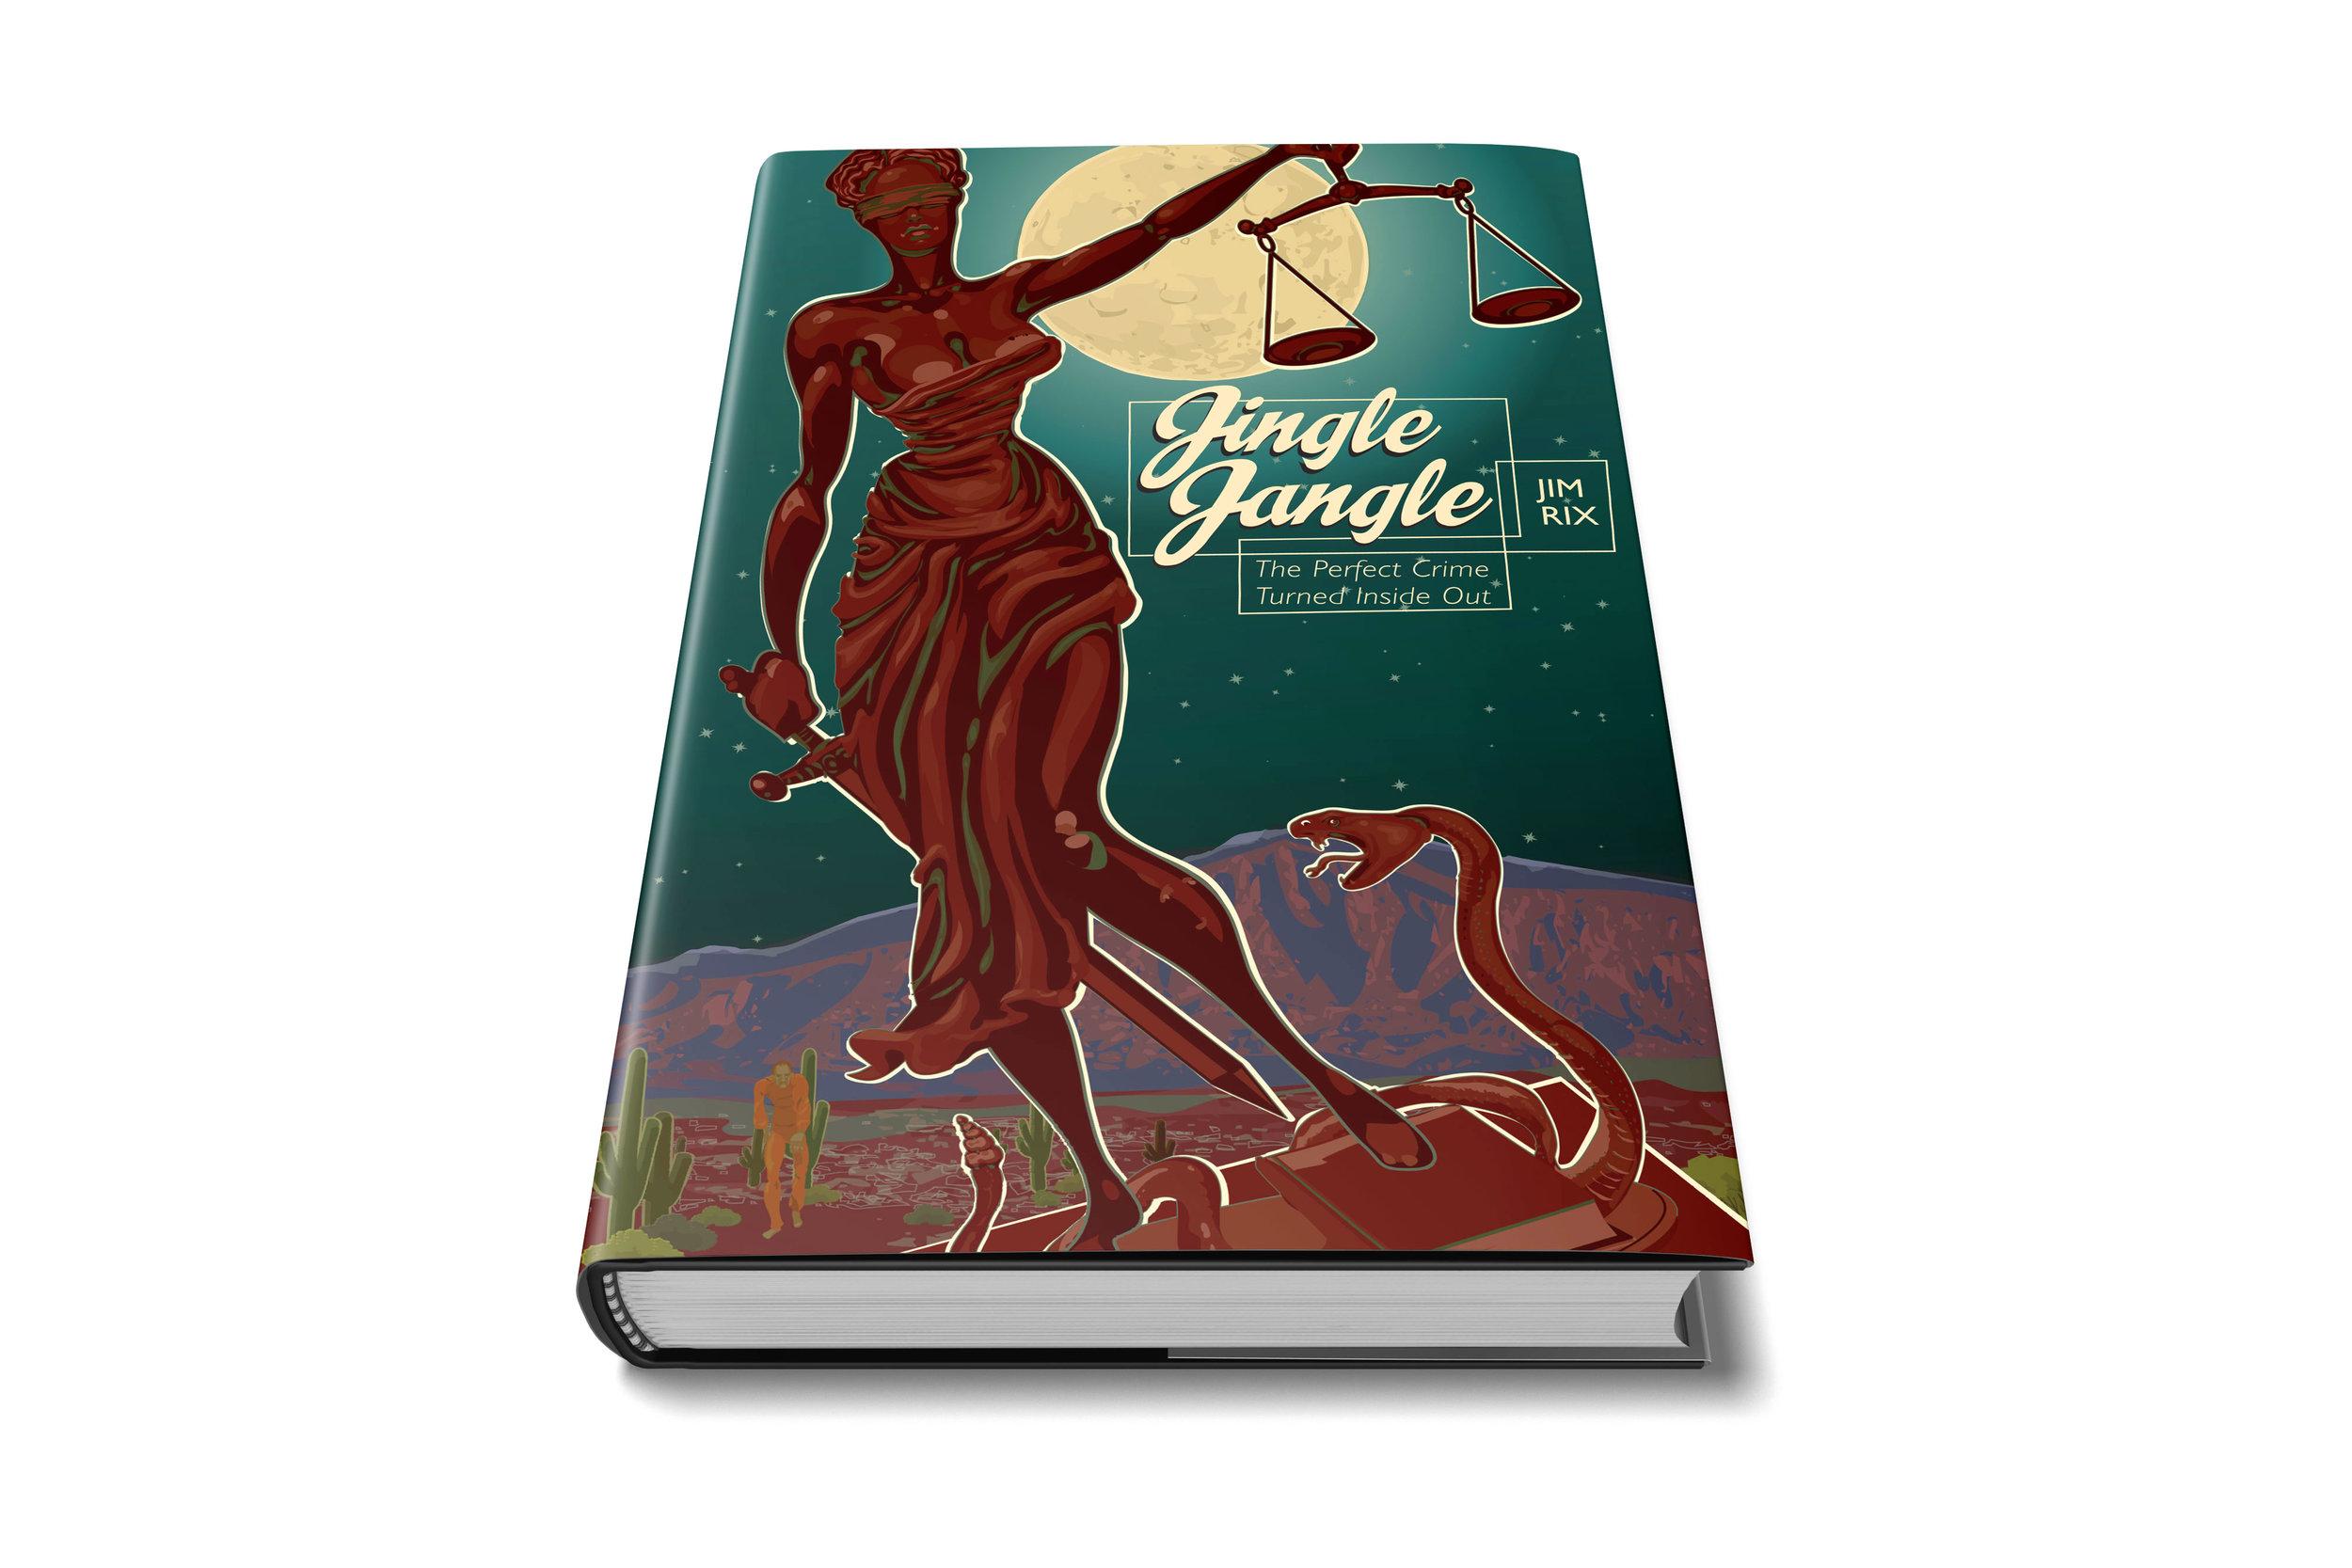 JINGLE JANGLE BY JIM RIX Book Cover & Logo Design